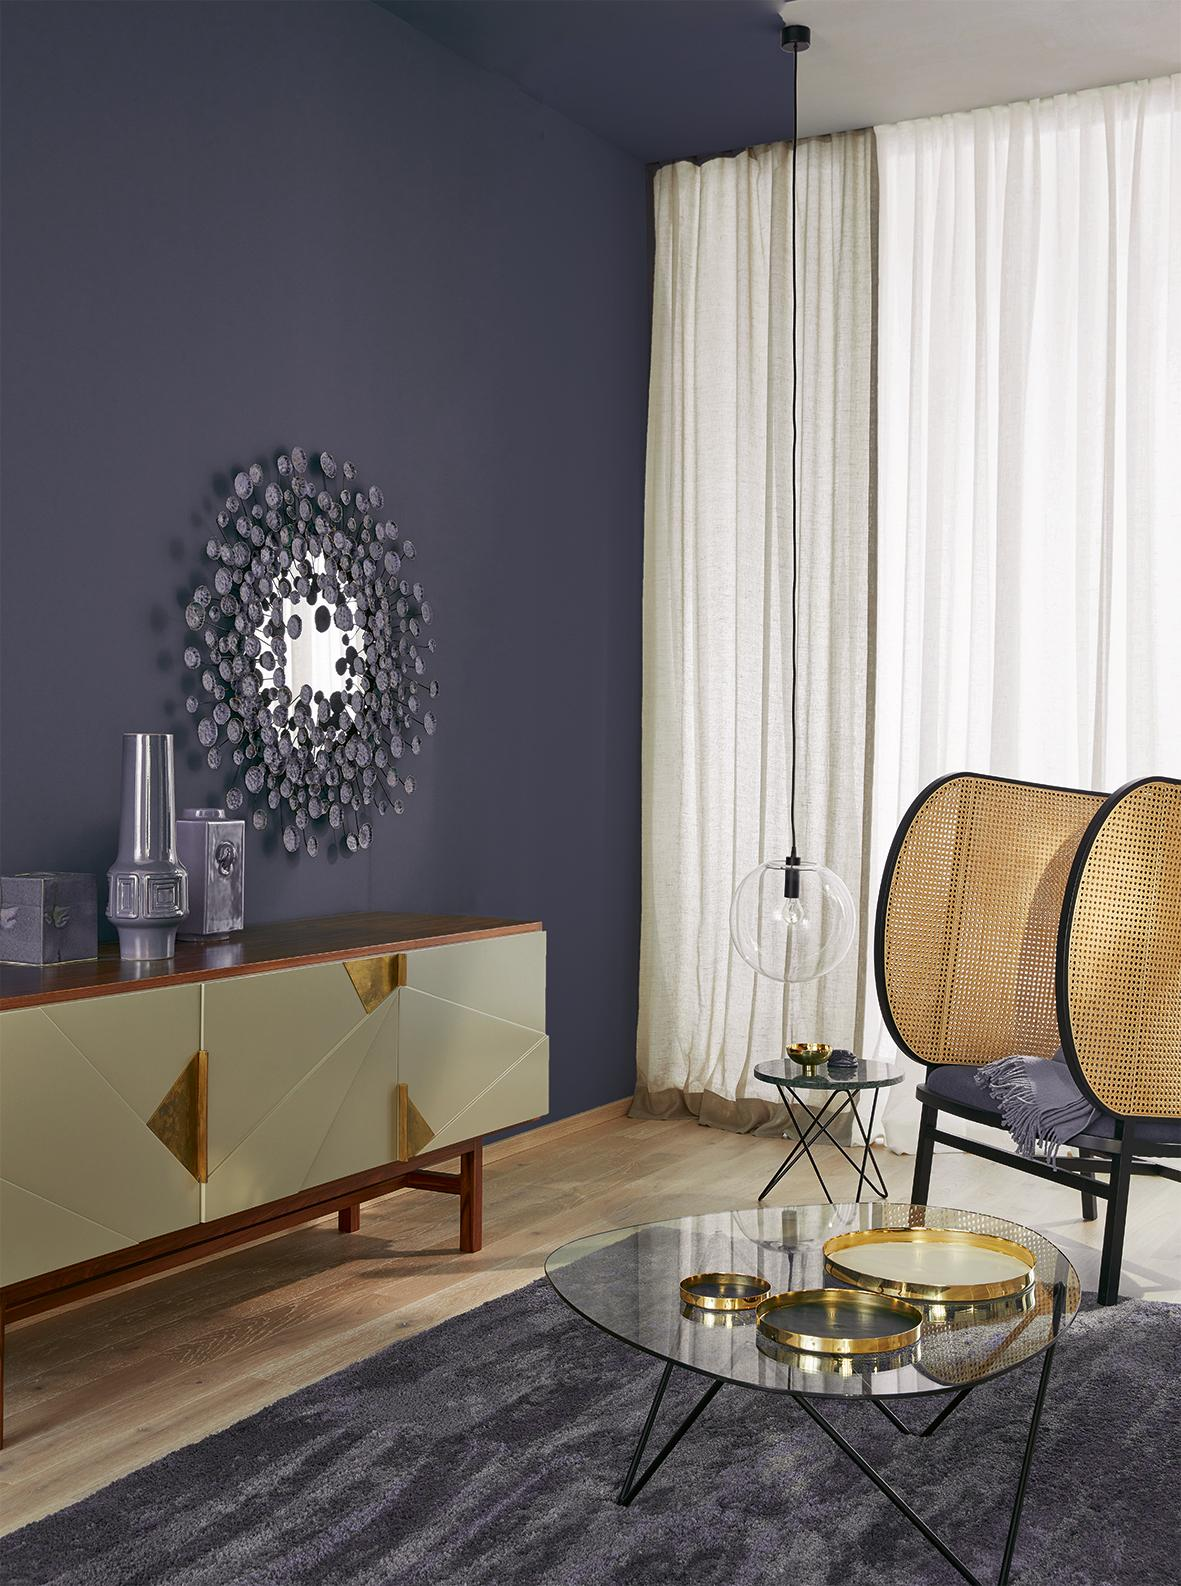 wandfarbe in blau • bilder & ideen • couchstyle, Deko ideen